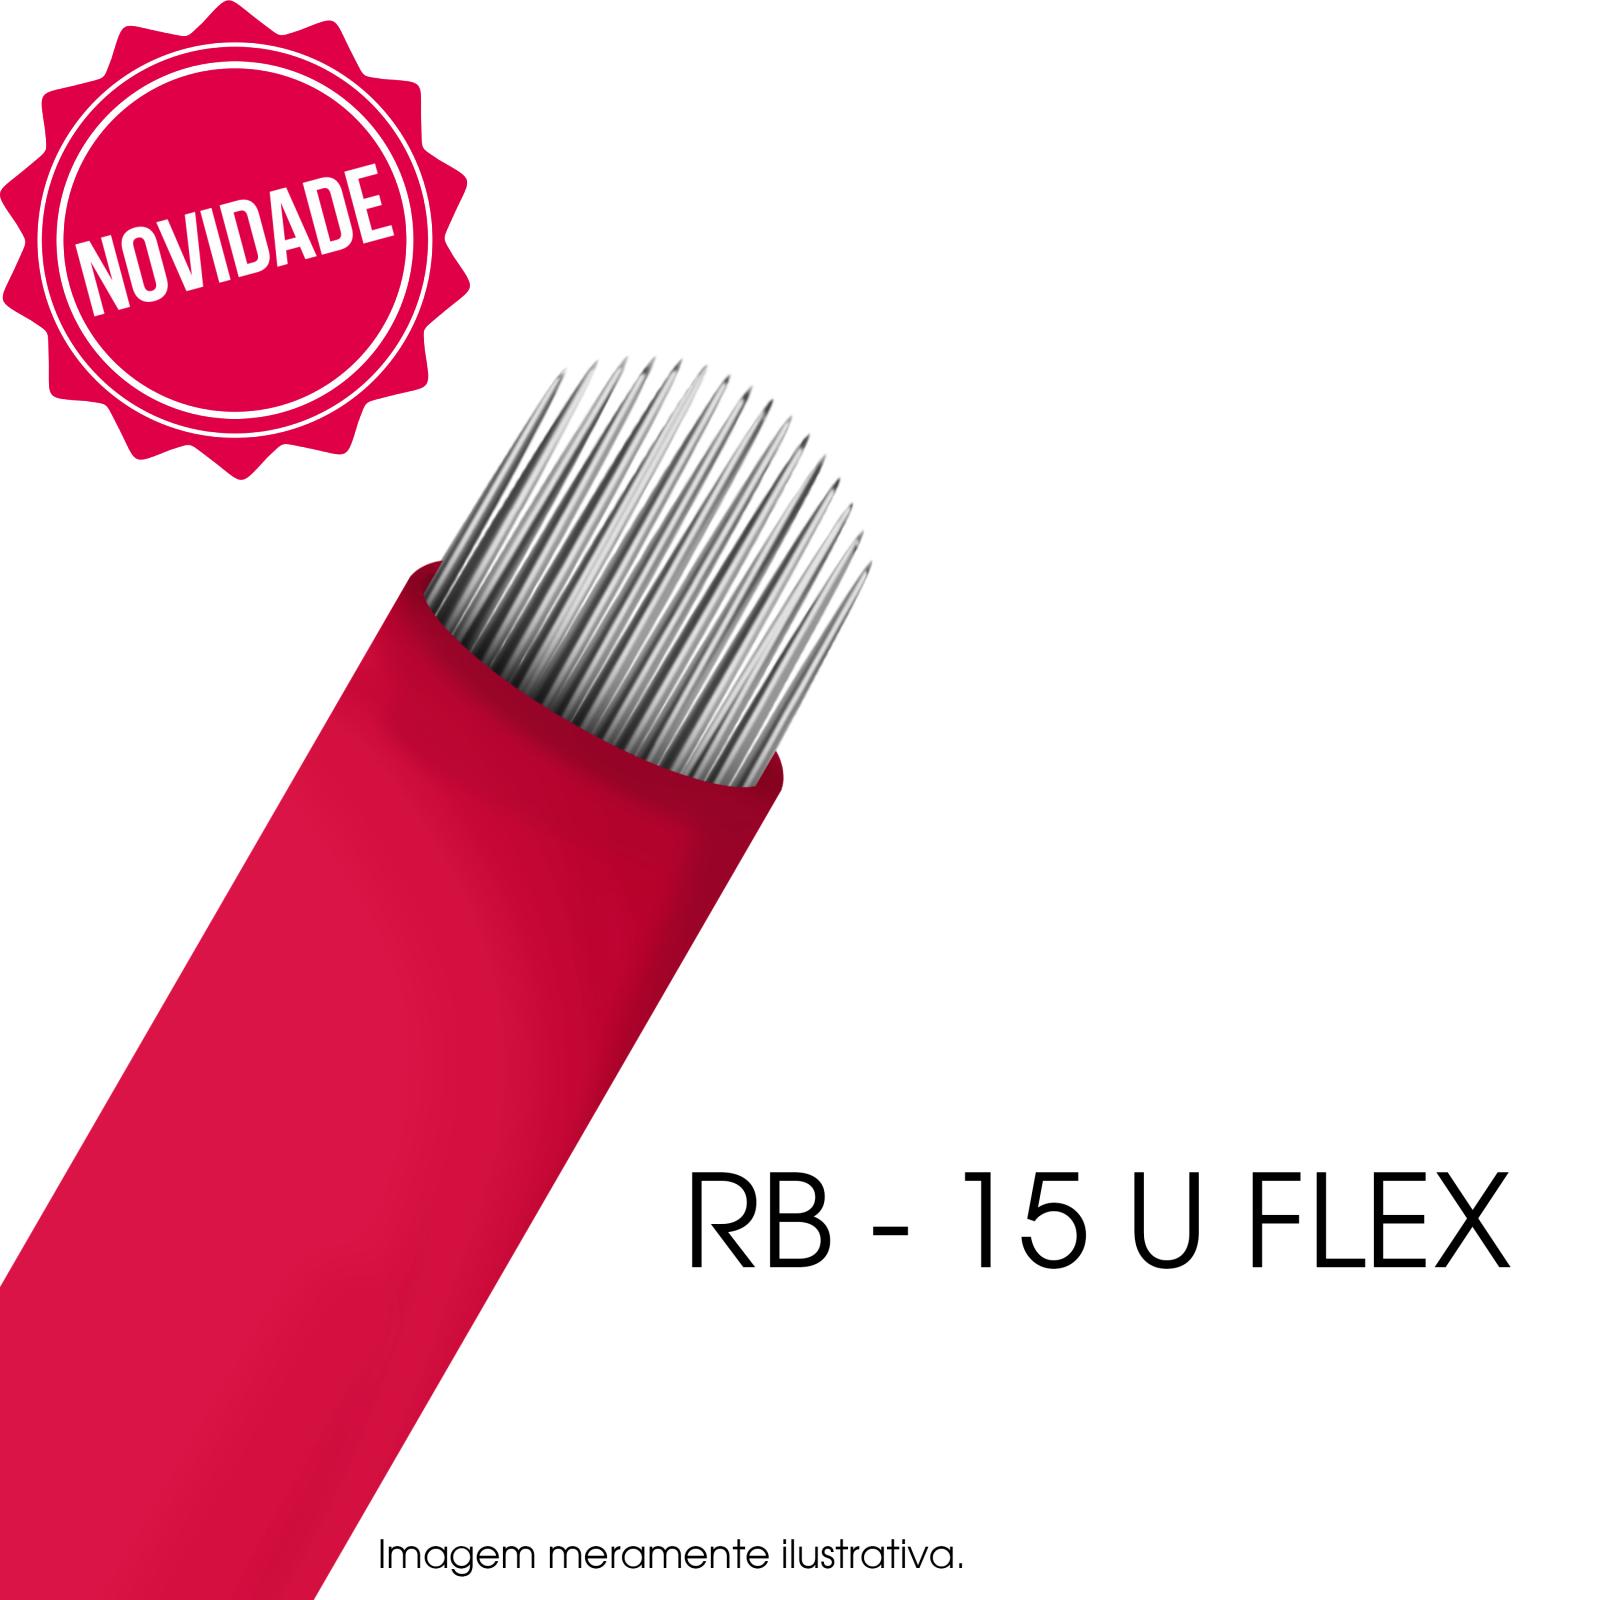 INDUCTOR SHINE RB KOLLORS - 15 U FLEX  - RB Kollors